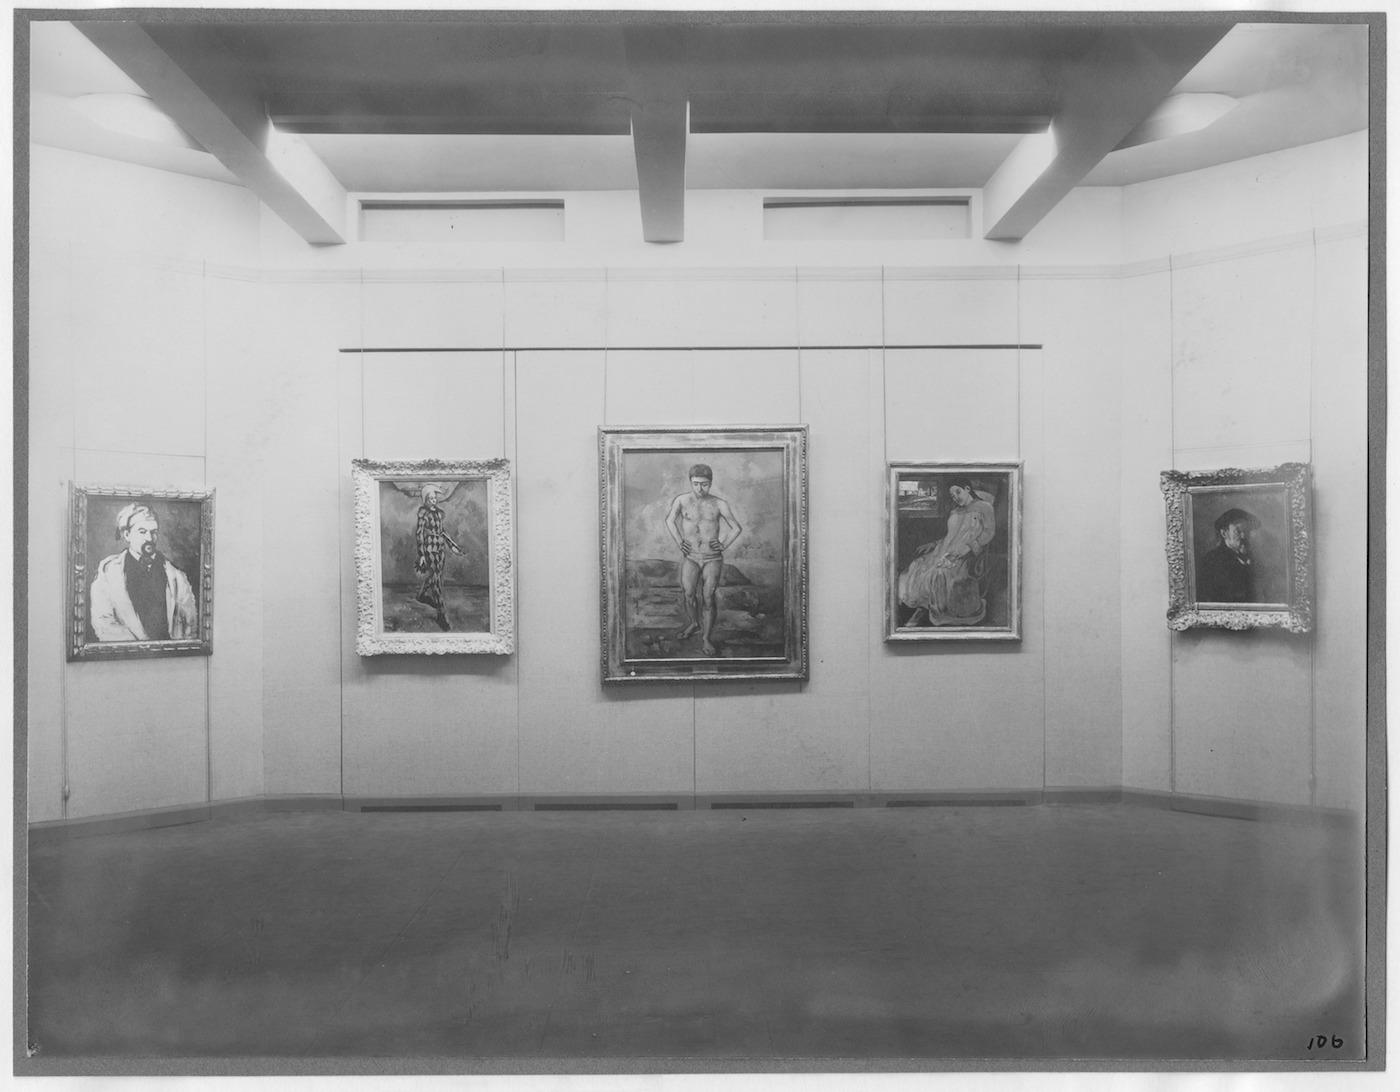 IN1 Cezanne, Gauguin, Seurat, Van Gogh, November 7, 1929-December 7, 1929